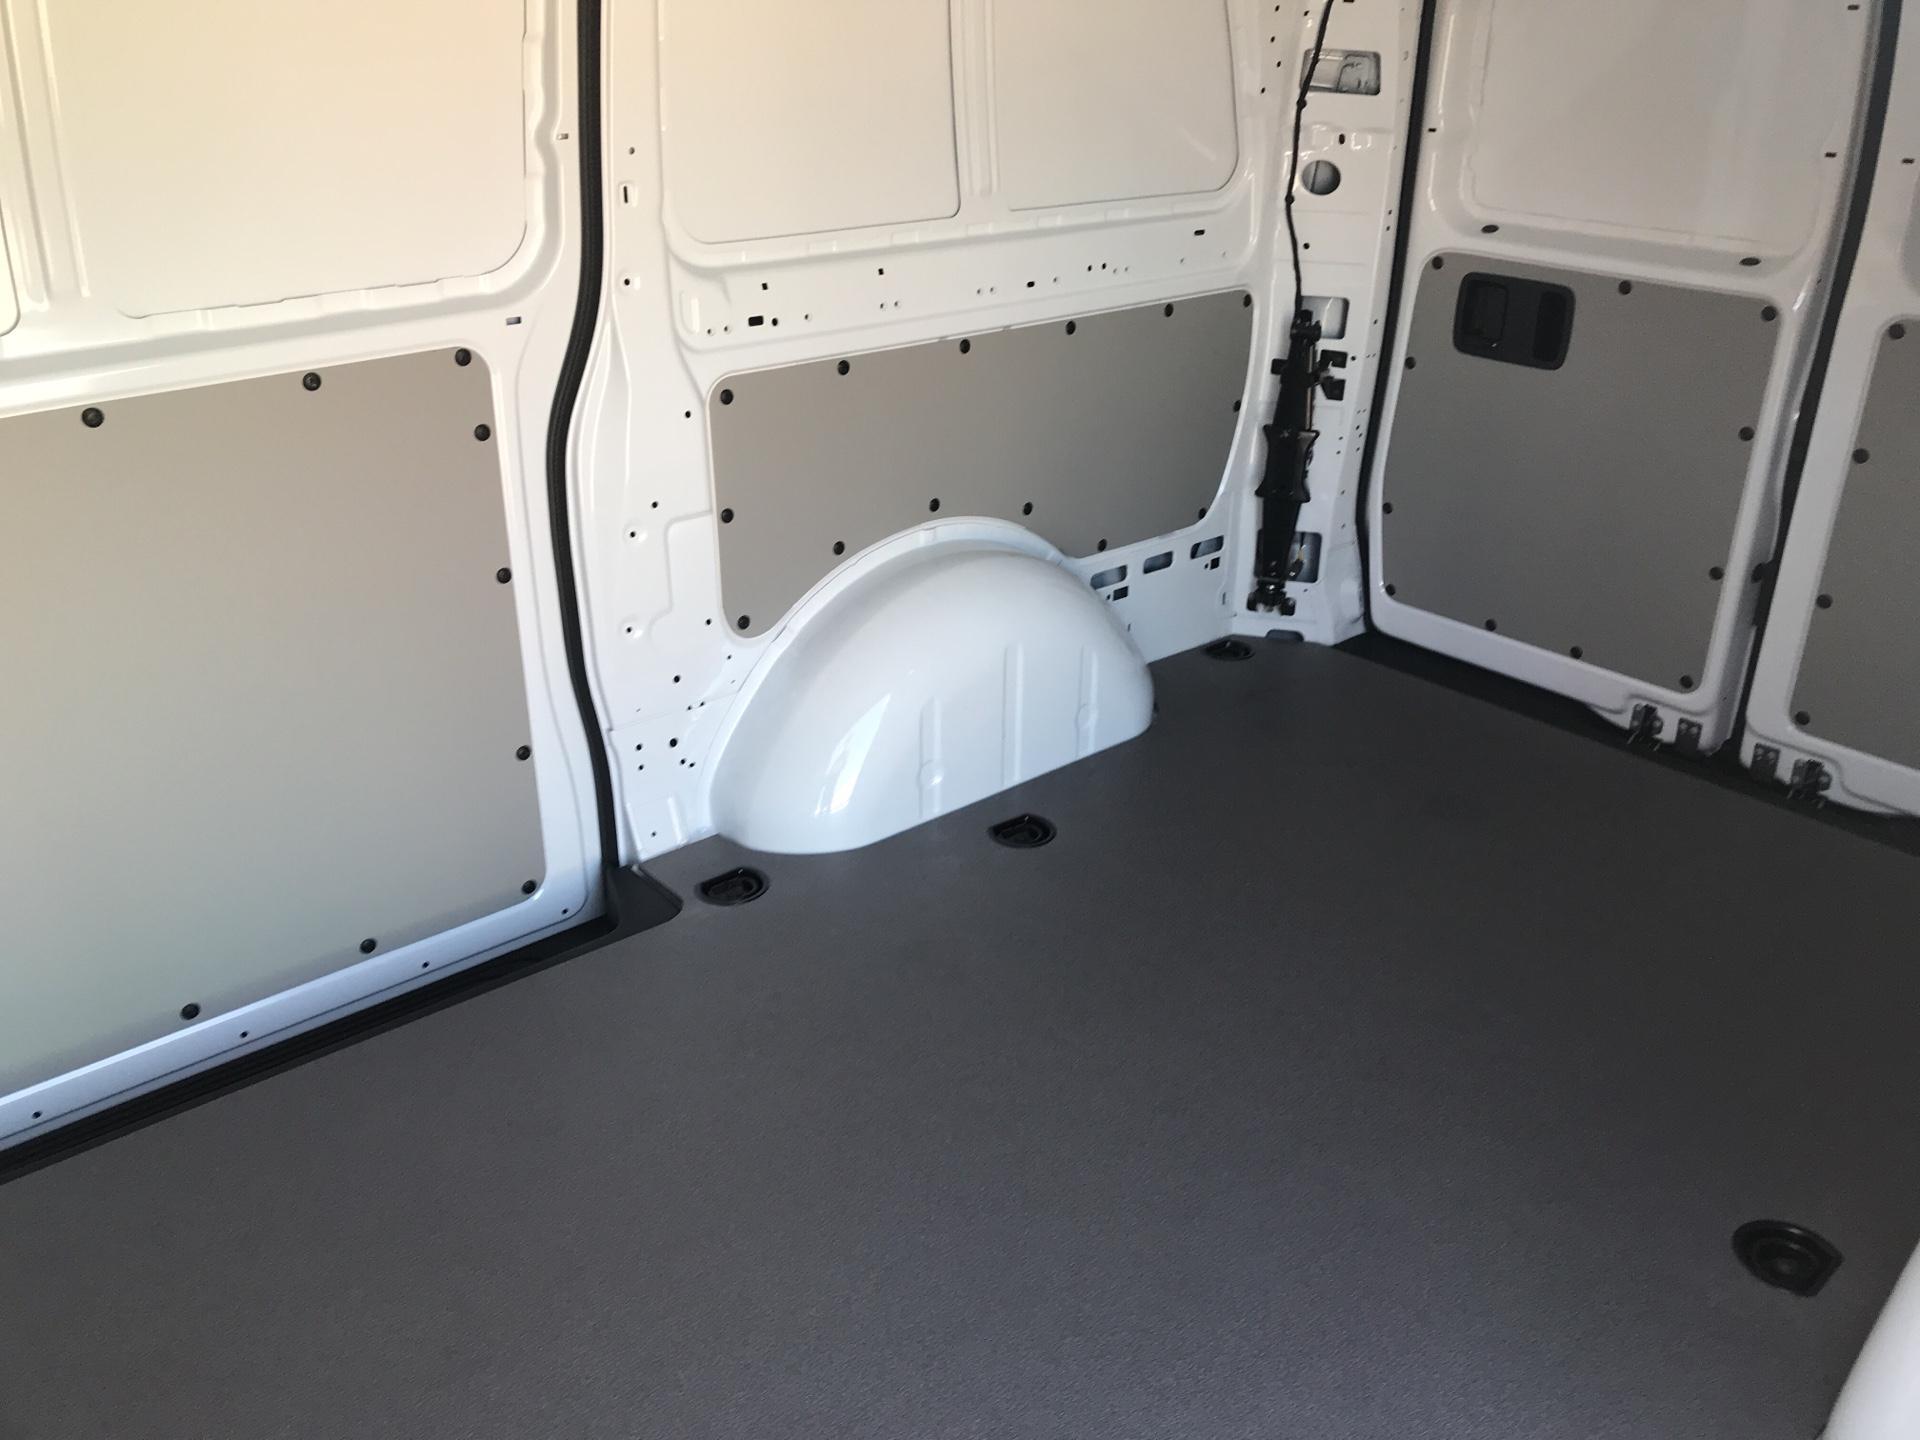 2019 Mercedes-Benz Vito 111Cdi Van Euro 6 Massive specification A/C (YN19ZFW) Image 16